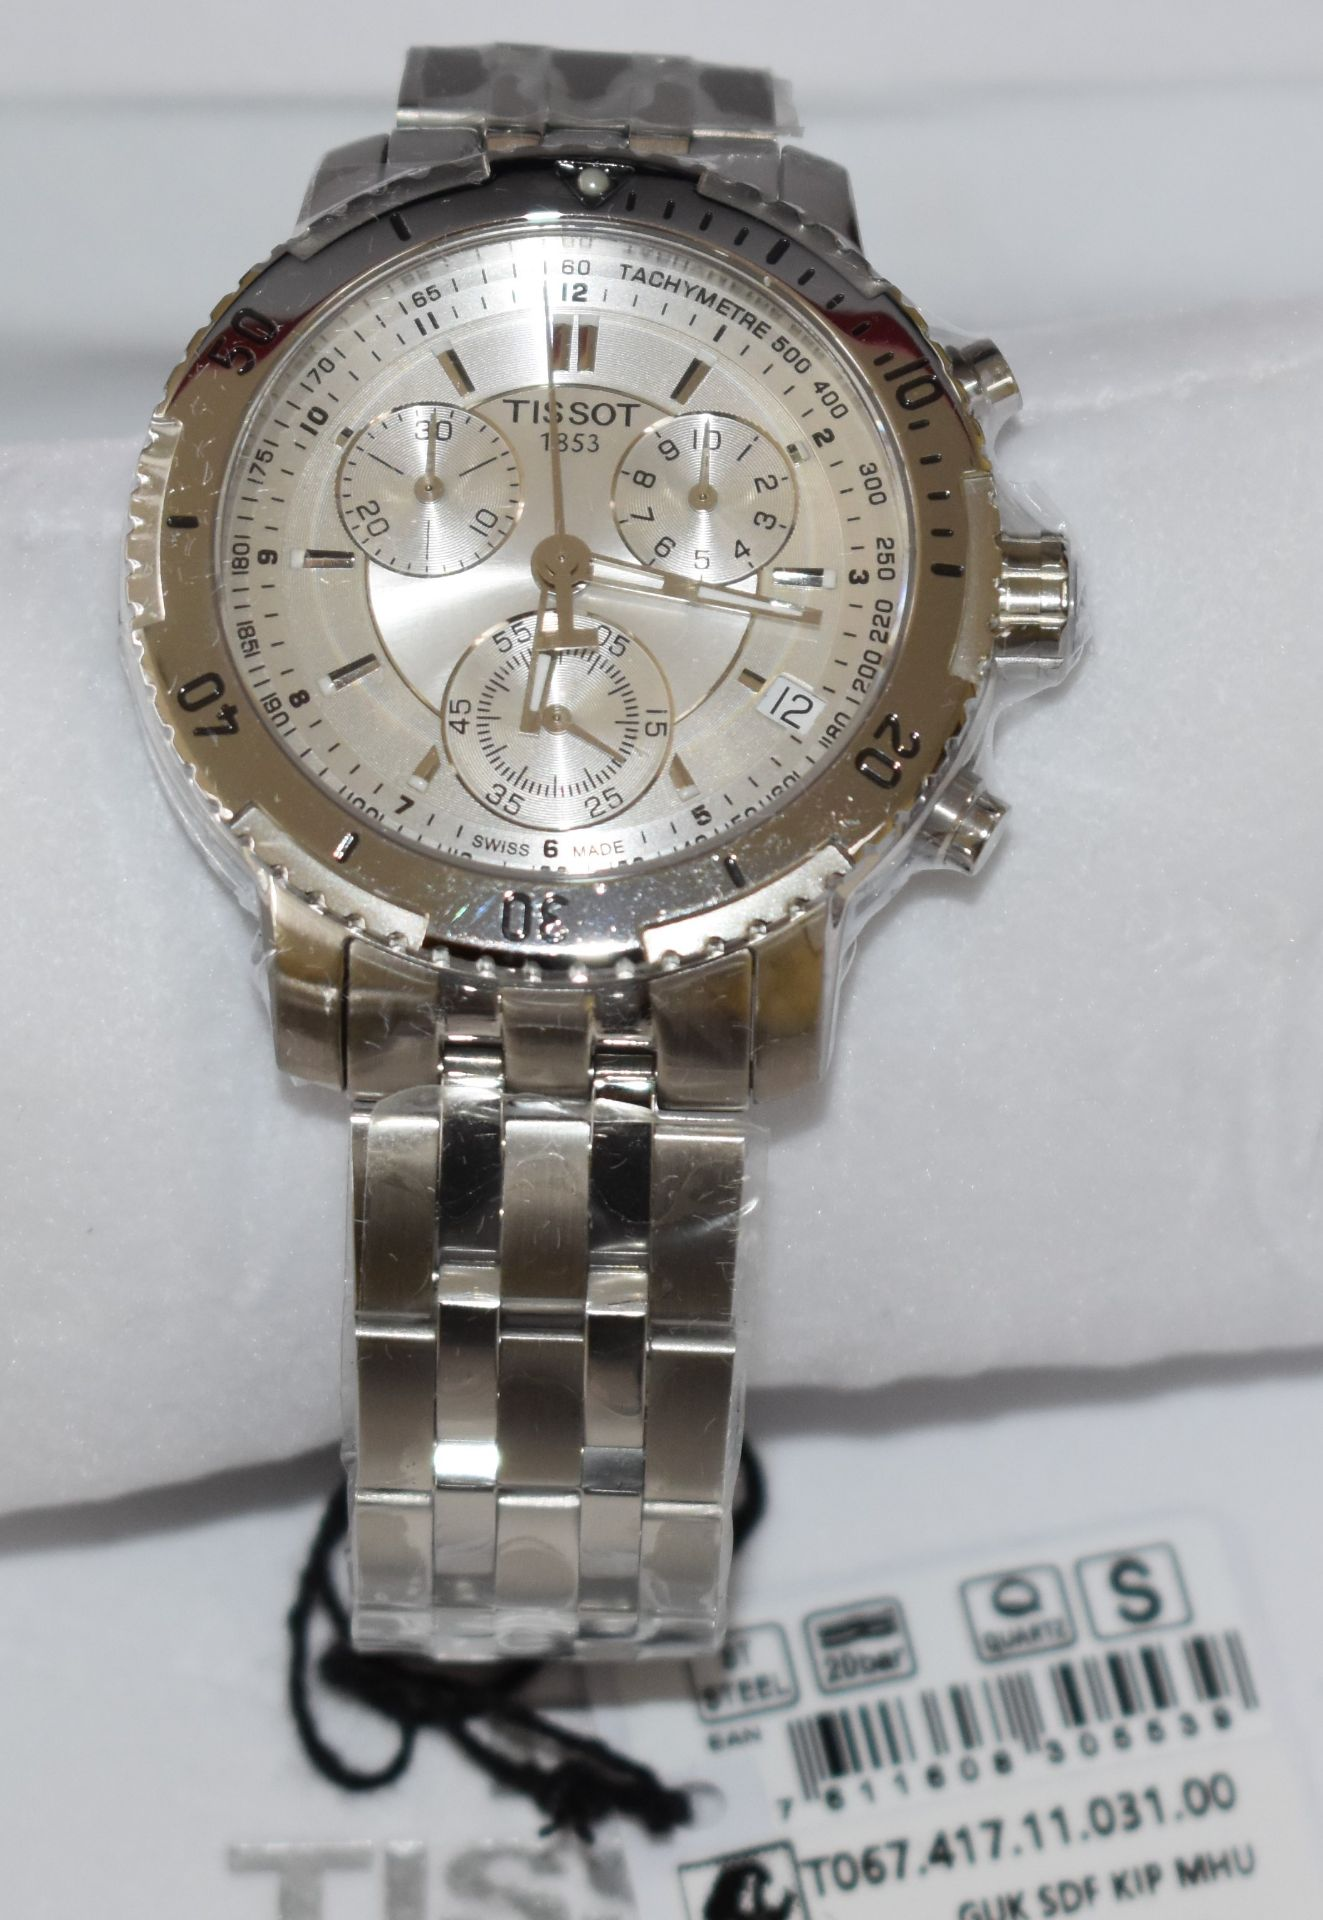 Tissot Men's Watch TO67.417.11.31.00 - Image 2 of 3